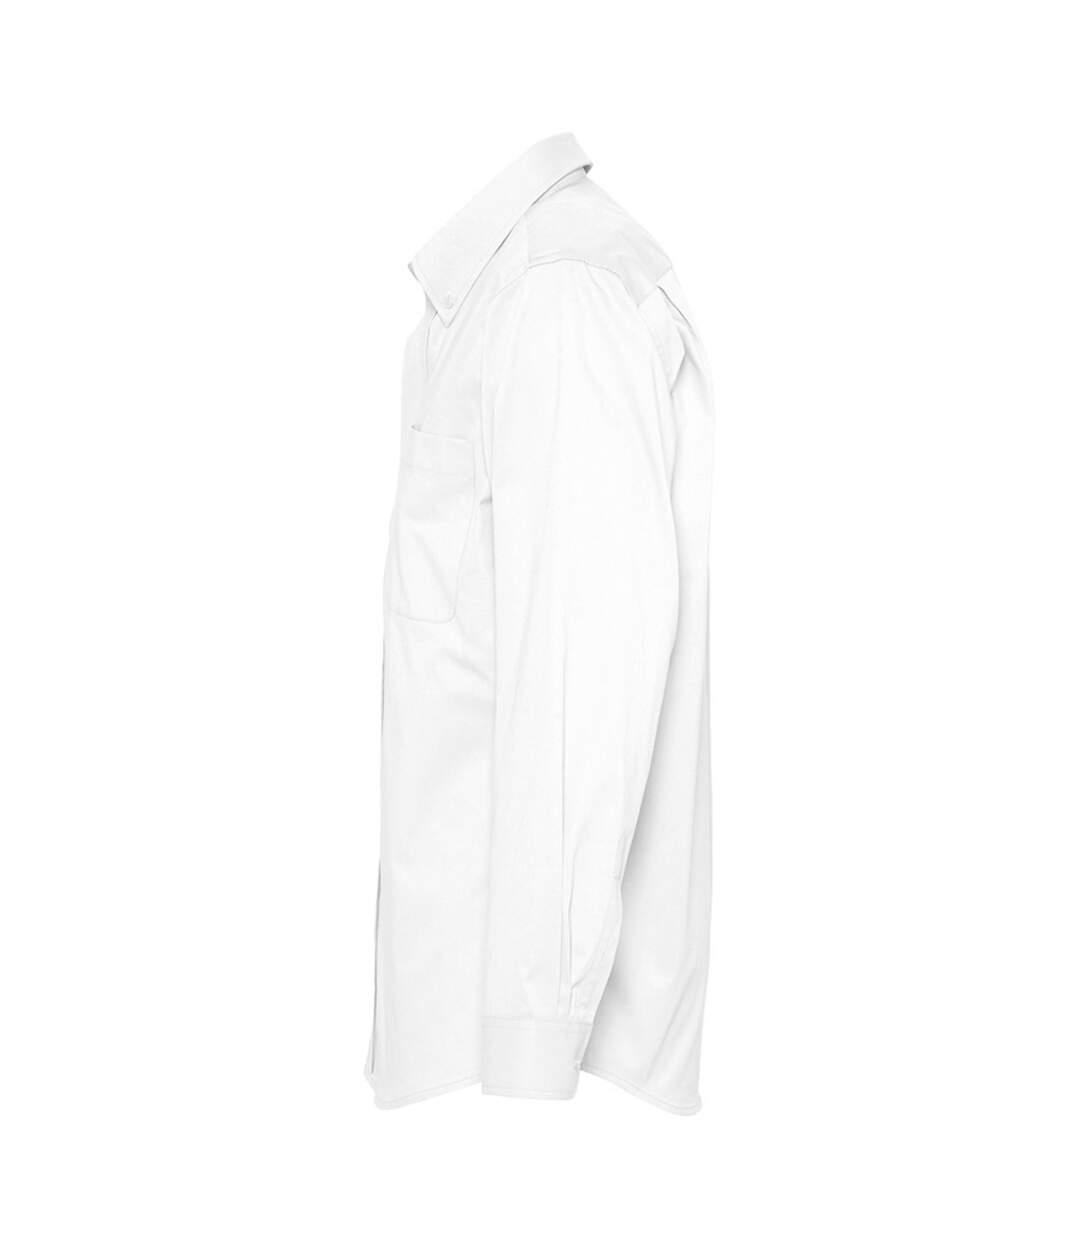 SOLS Mens Bel-Air Long Sleeve Twill Work Shirt (White) - UTPC389